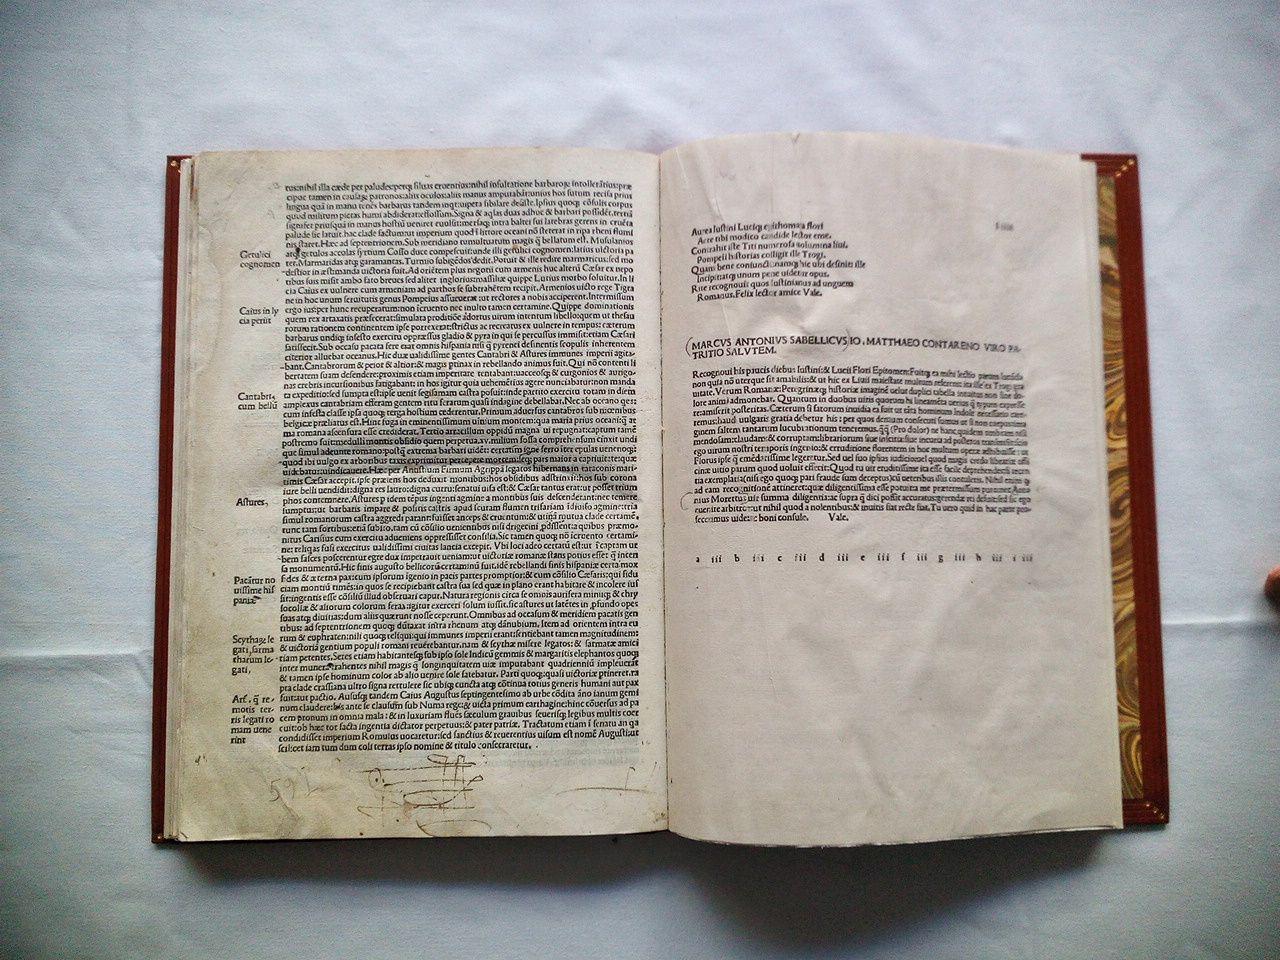 [Fol. I recto, sin numerar, ] IVSTINI HISTORICI [Fol. II recto, sign. aii] IVSTINI HISTORICI CLARISSIMI IN TROGI POMPEII HISTORIAS EXORDIUM / [continúa] (C) VM multi ex Romanis etiam conf(s)ularis dignitatis u(v)iri res romanas graeco per.../ [Fol. XXXVII verso, al final] Iuf(s)tini hif(s)torici u(v)iri clariff(ss)imi epithomatum in Trogi / Pompeii hif(s)torias liber.XLIIII.& ultimus feliciter finit. / [Fol. XXXVIII recto, sign. gii] Ad magnificum comitem Petru(m) Maria(m) Rubeu(m) Parme(n)f(s)em Philippi broaldi Bononienf(s)is Epif(s)tola. / [continúa a mitad de página] LV(U)CII FLORII GESTORV(U)M ROMANORV(U)M EPITHOMA INCIPIT. / [Fol. LIII -verso-, 59 lineas de impresión. Comienza en la linea 1] tus:nihil illa caede per paludes:perq3(ue) f(s)iluas cruentius:nihil inf(s)ultatione barbaror intollera(n)tius:prae / [y al final, en la linea 59 y última, dice] f(s)cilicet iam tum dum coli terras ipf(s)o nomine & titulo conf(s)ecraretur. / [Fol. LIIII -recto-, con 27 lineas de impresión. Co